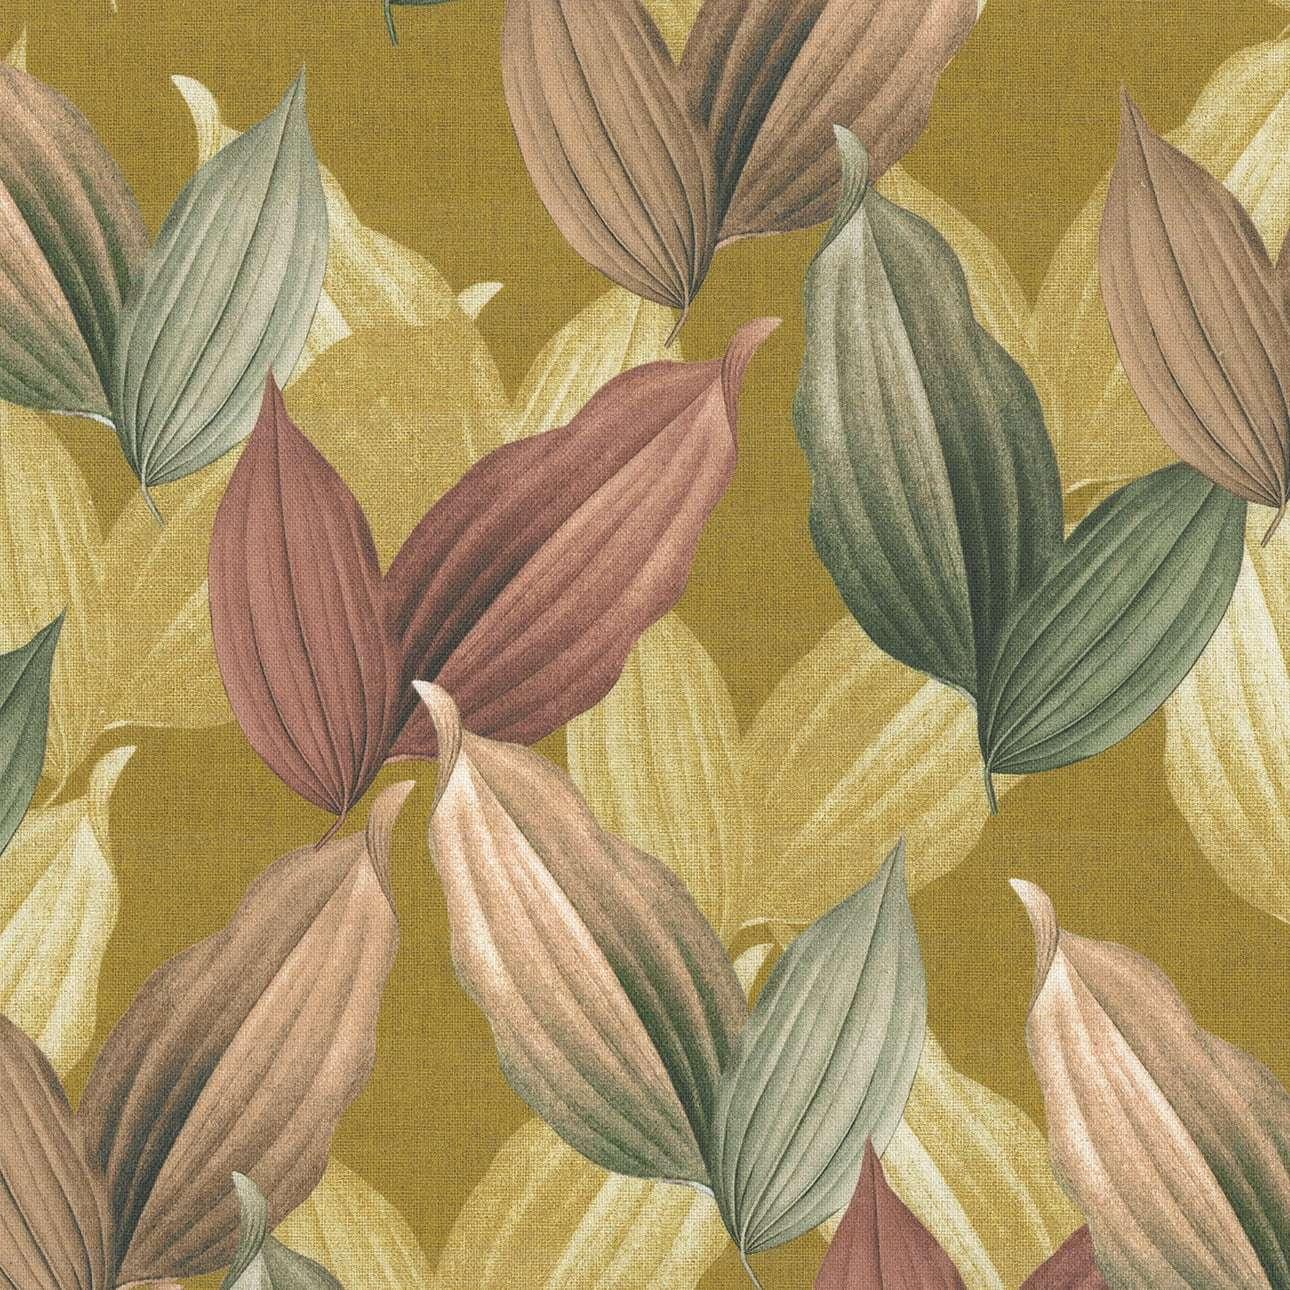 Podkładka 2 sztuki w kolekcji Abigail, tkanina: 143-22